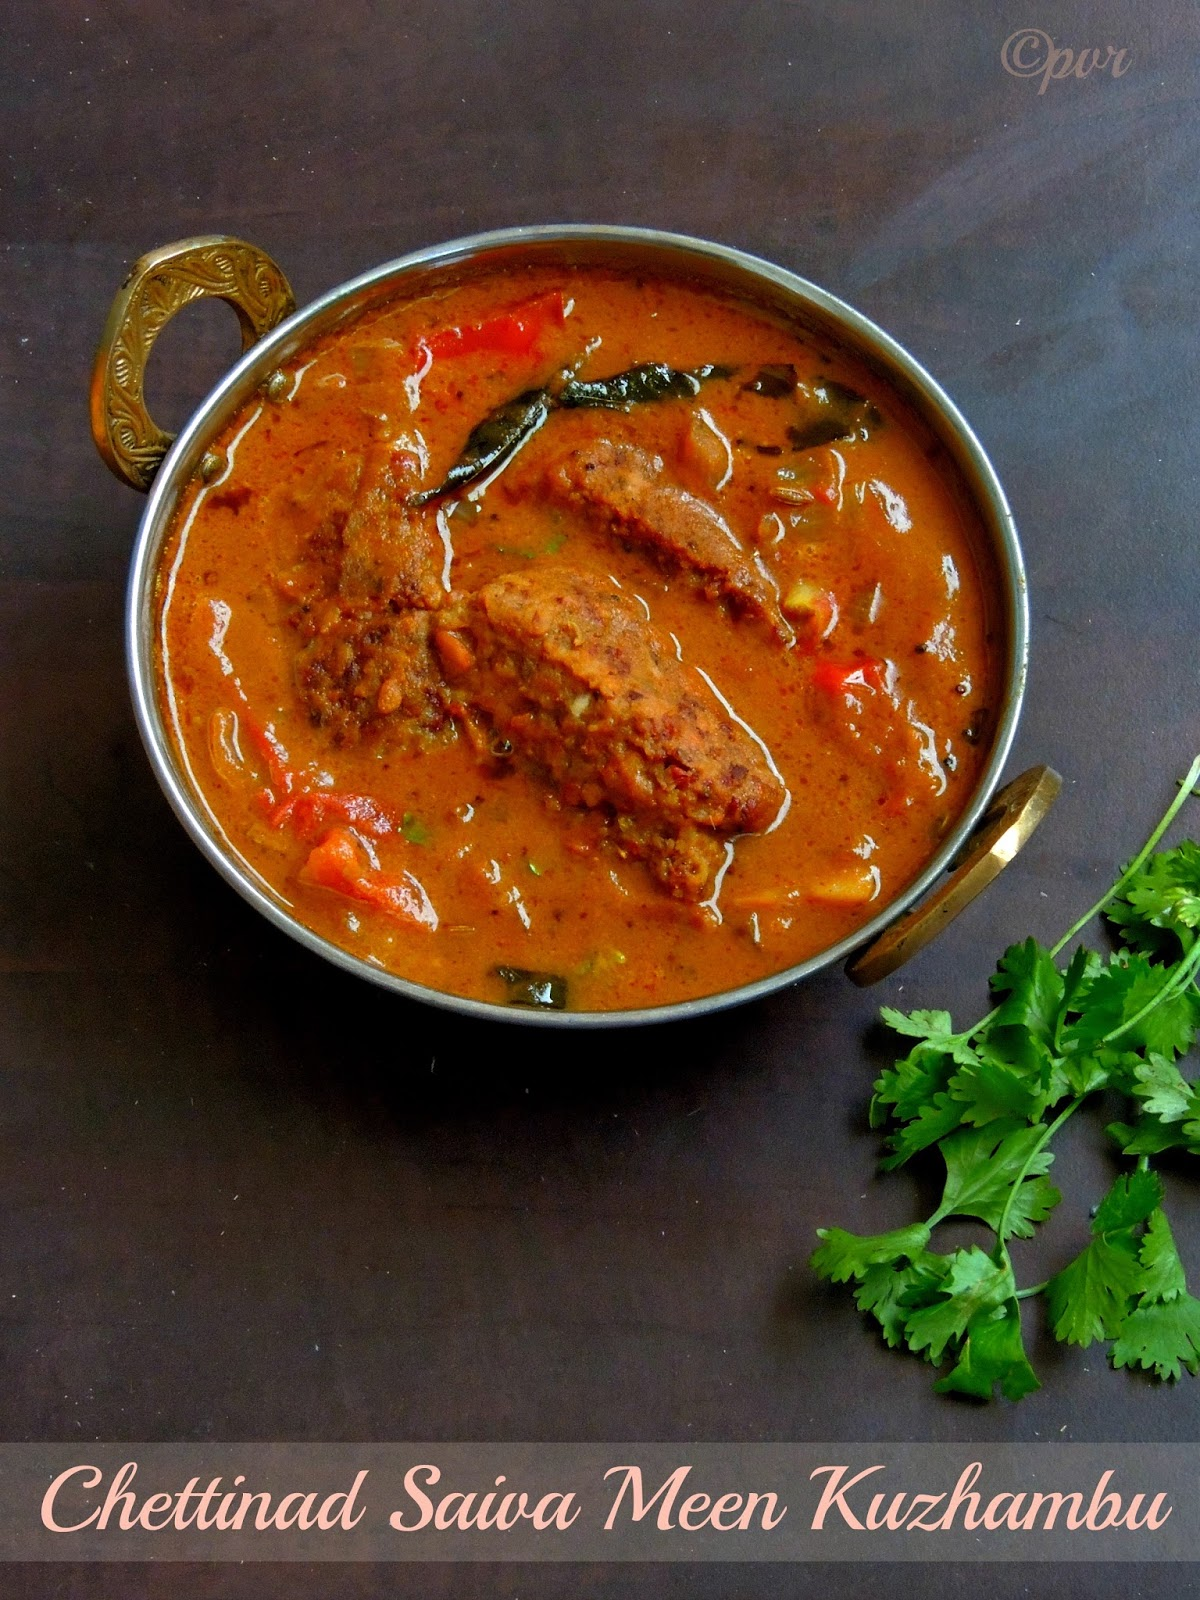 Priyas versatile recipes chettinad saiva meen kuzhambuvegetarian chettinad saiva meen kuzhambuvegetarian fish gravy forumfinder Gallery